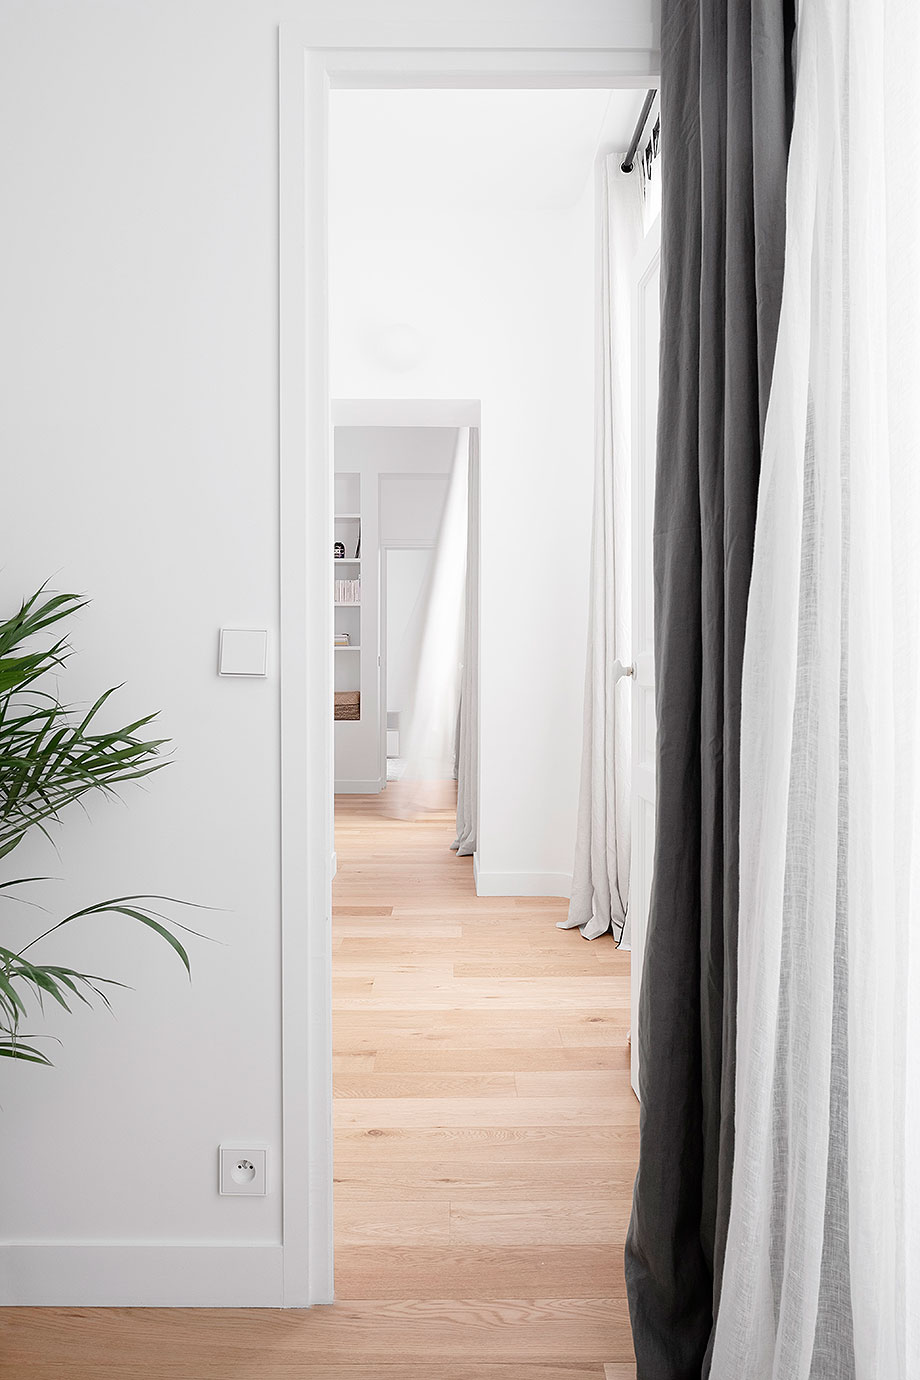 reforma integral de un apartamento en paris por anthropie architecture (s) (12) - foto juliette alexandre